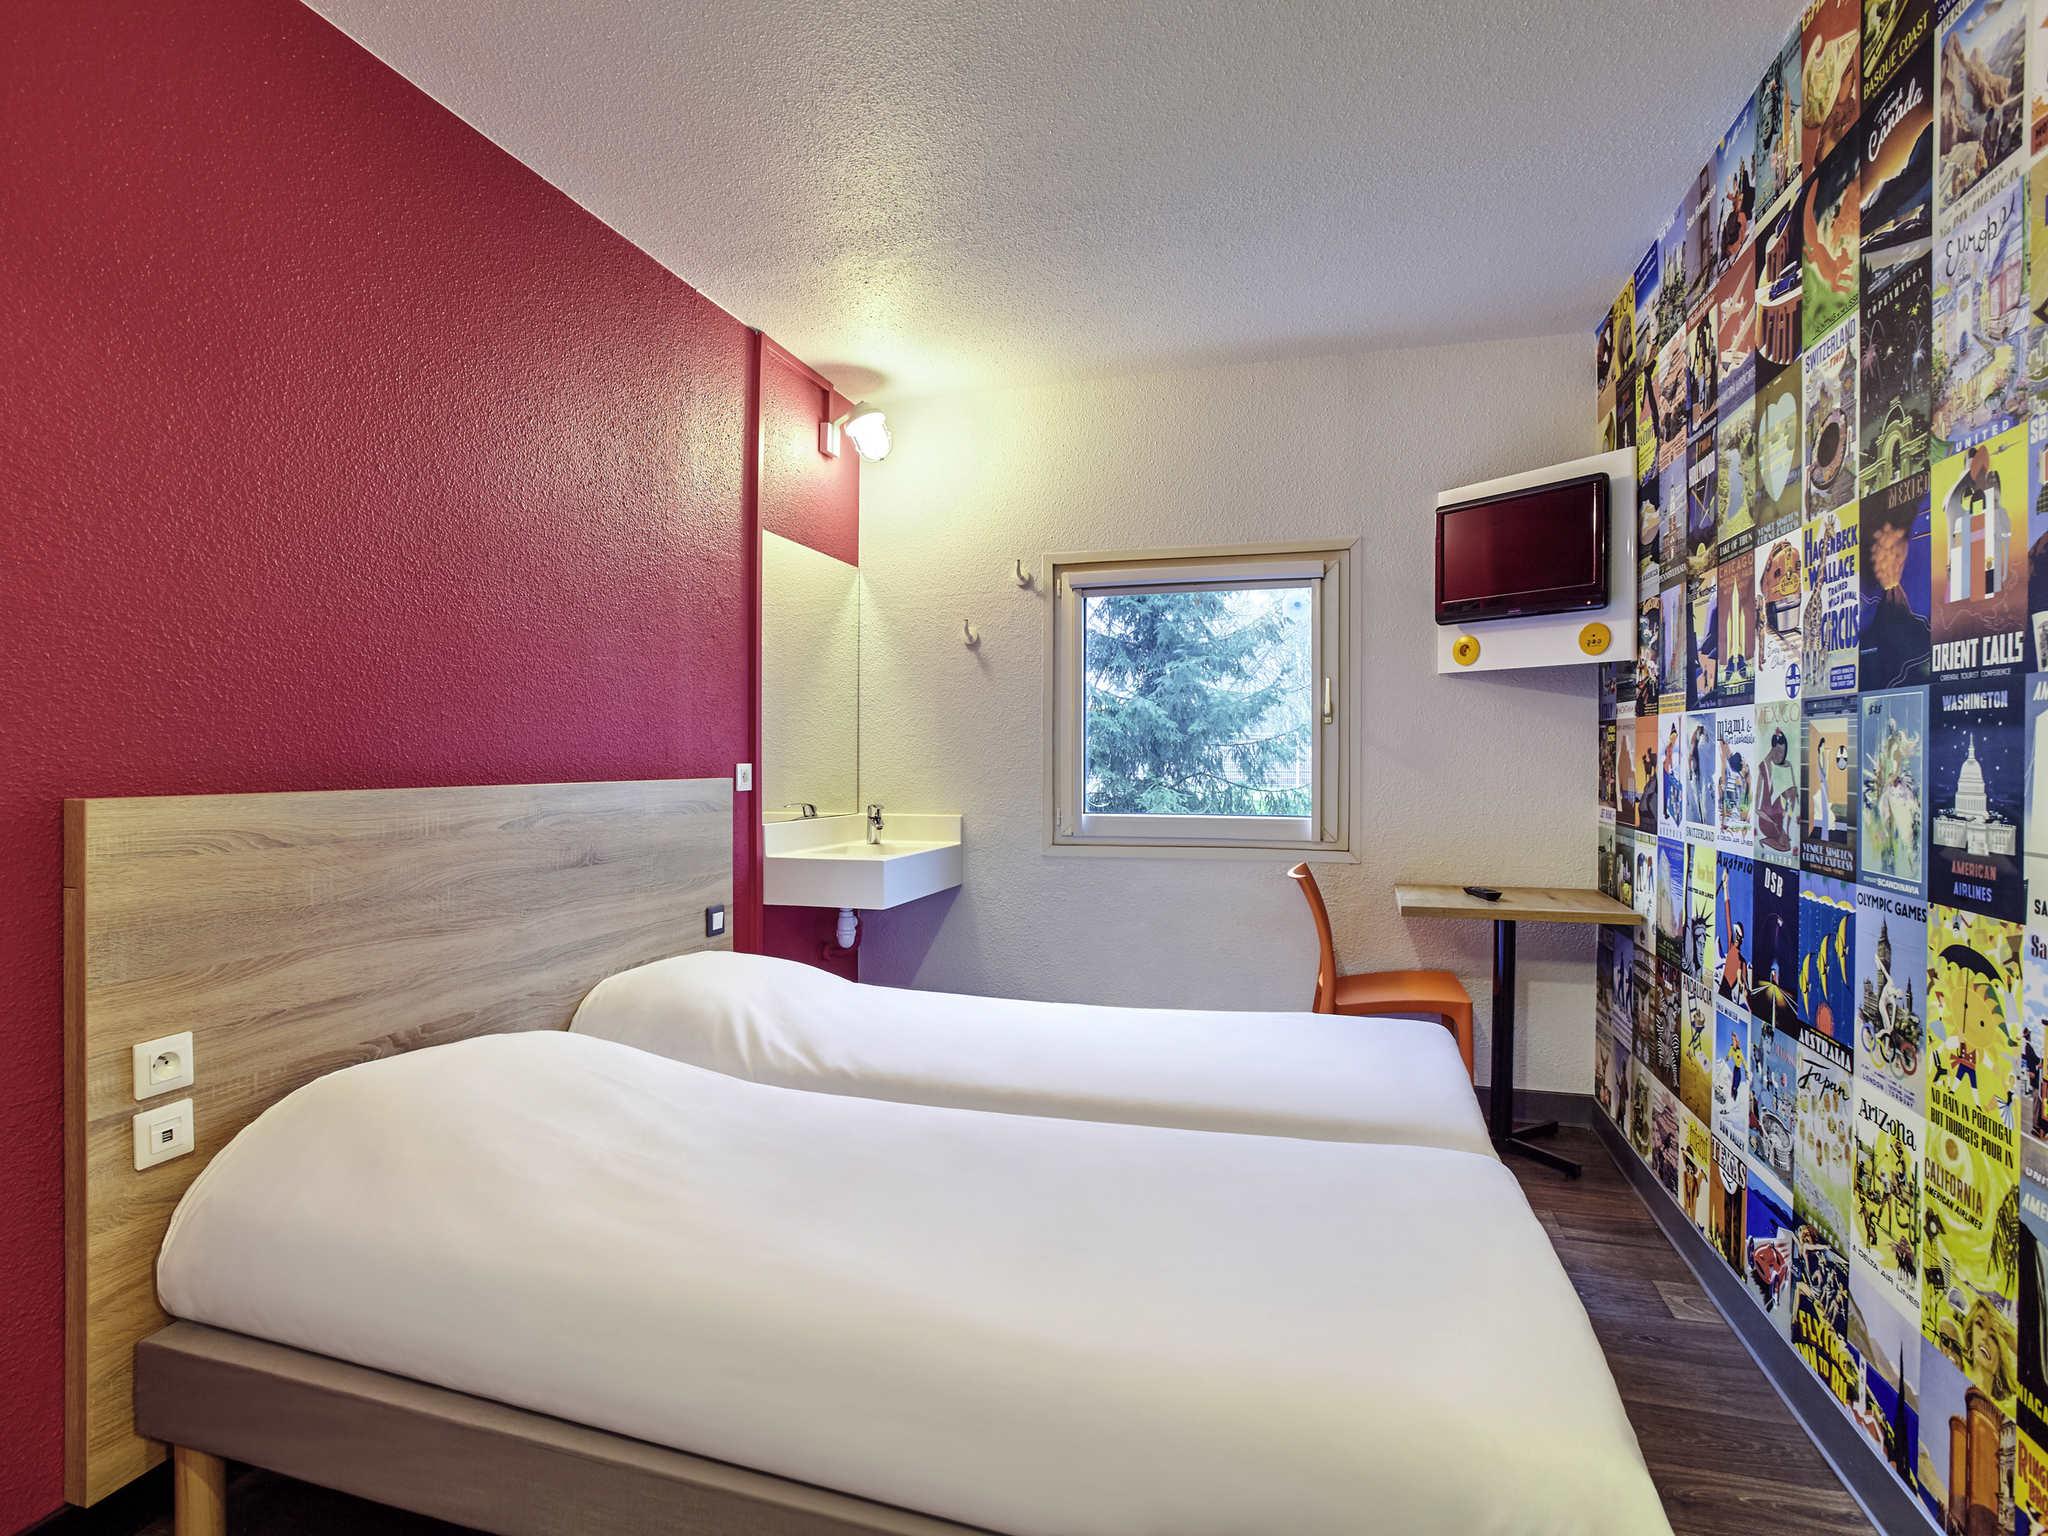 Hotel – hotelF1 Brétigny sur Orge